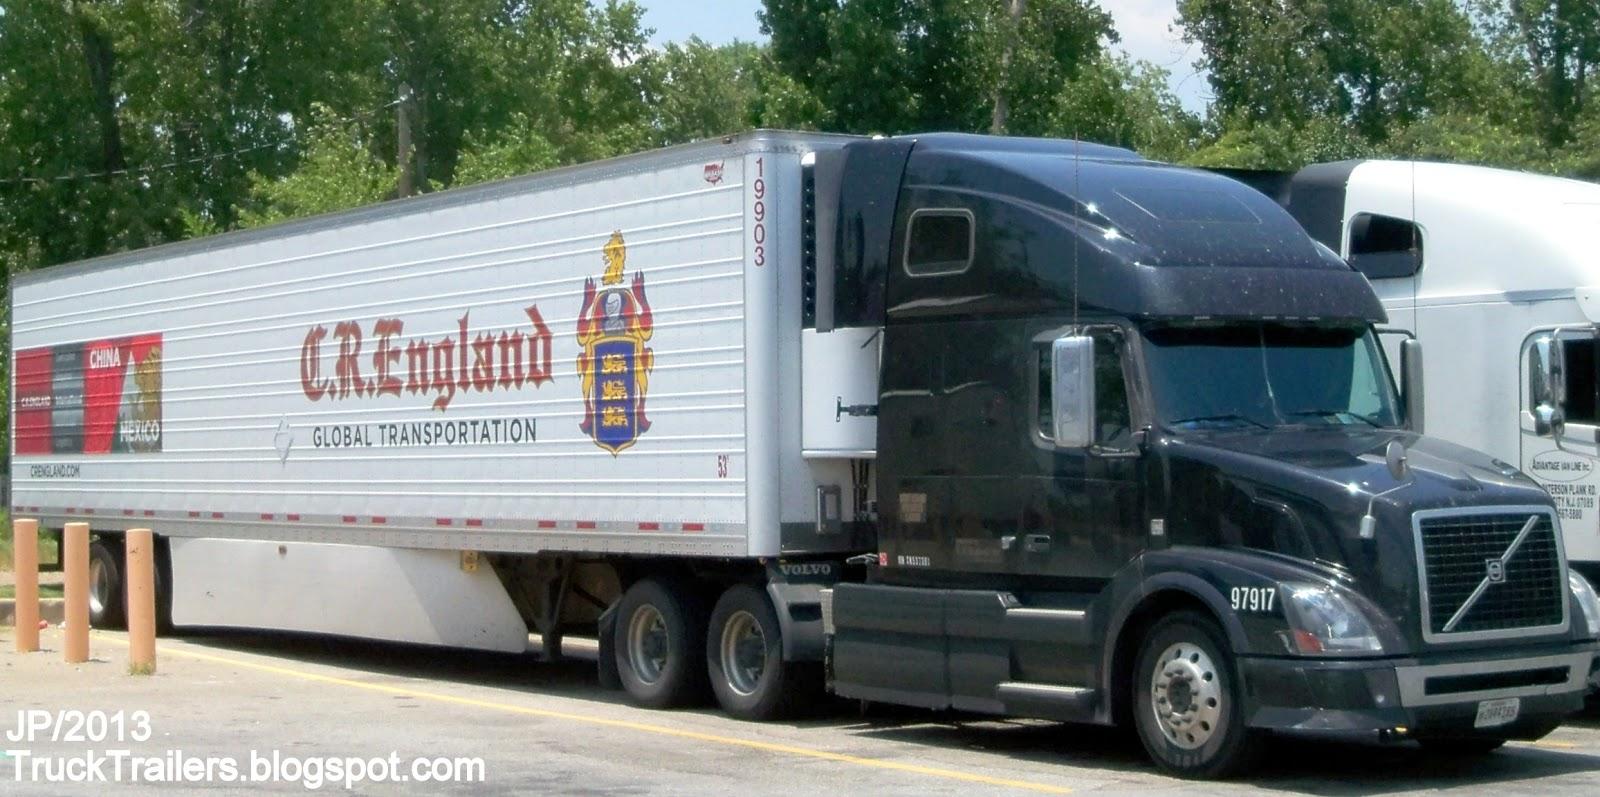 C r england transportation volvo sleeper cab truck c r england global transportation trucking company wabash 53 refrigerated trailer